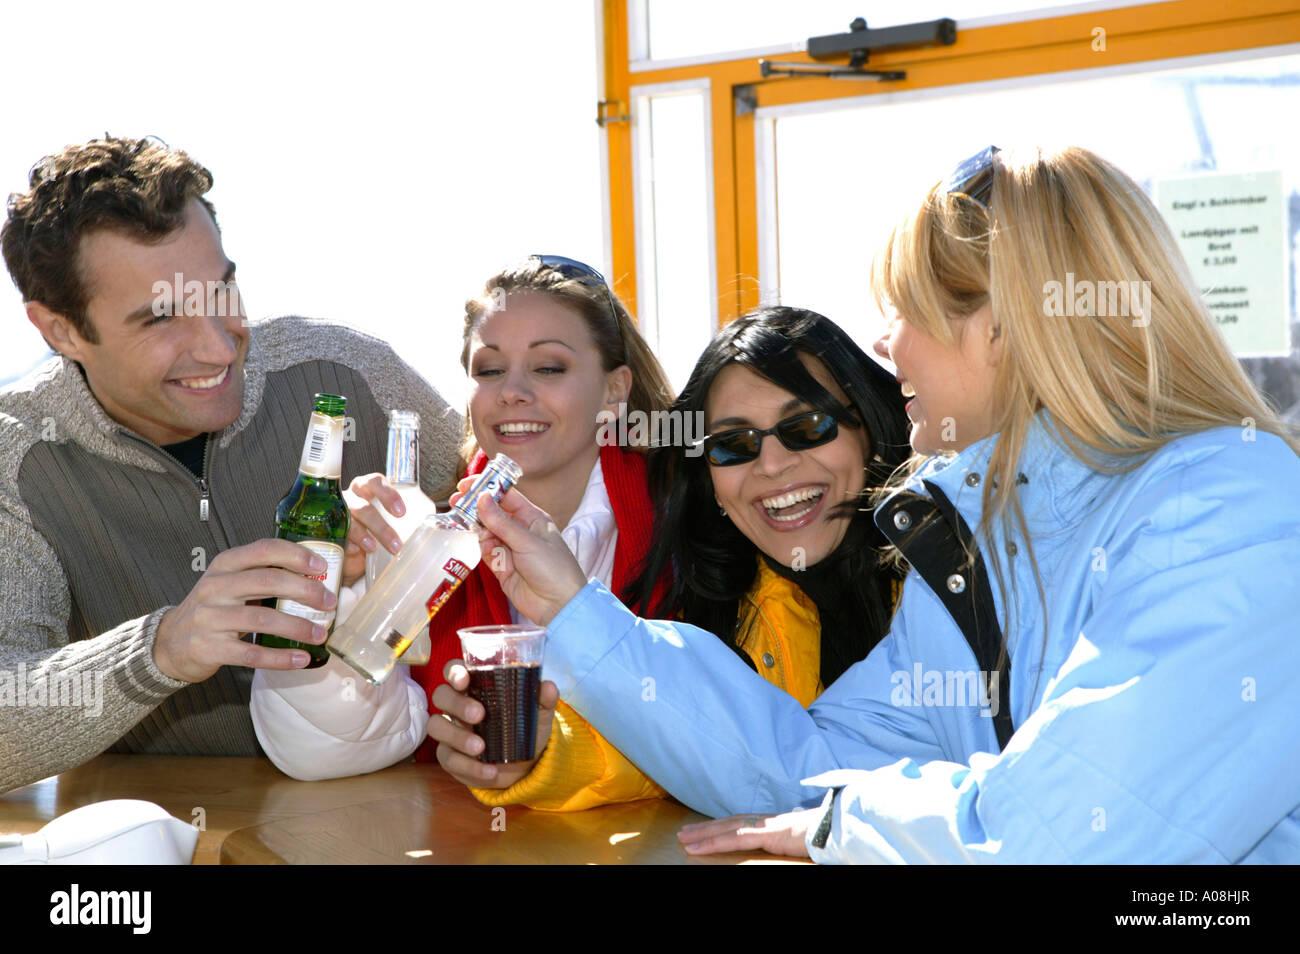 Junge Leute beim Apres-ski im Winterurlaub, young people at apres ski in winter holiday - Stock Image